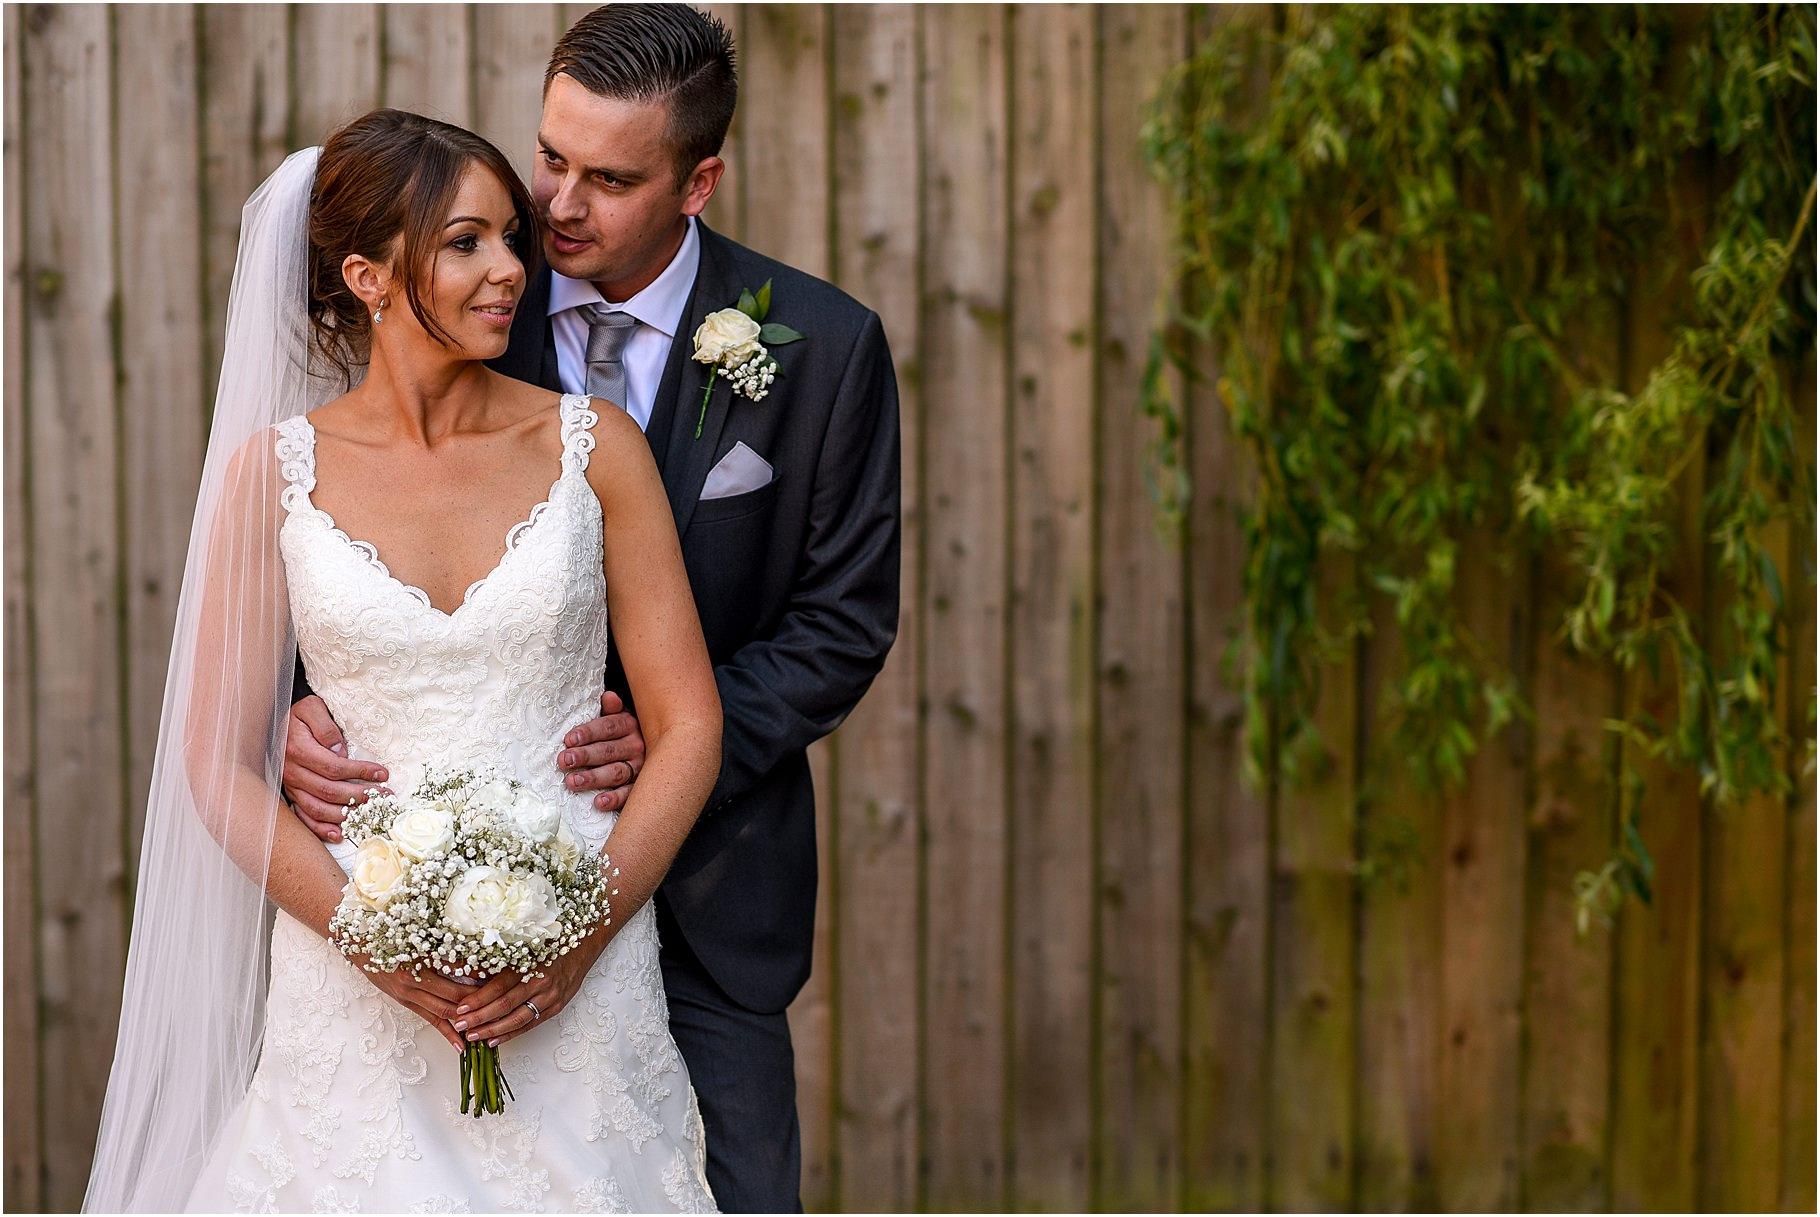 the-villa-wrea-green-wedding-photographer-51.jpg